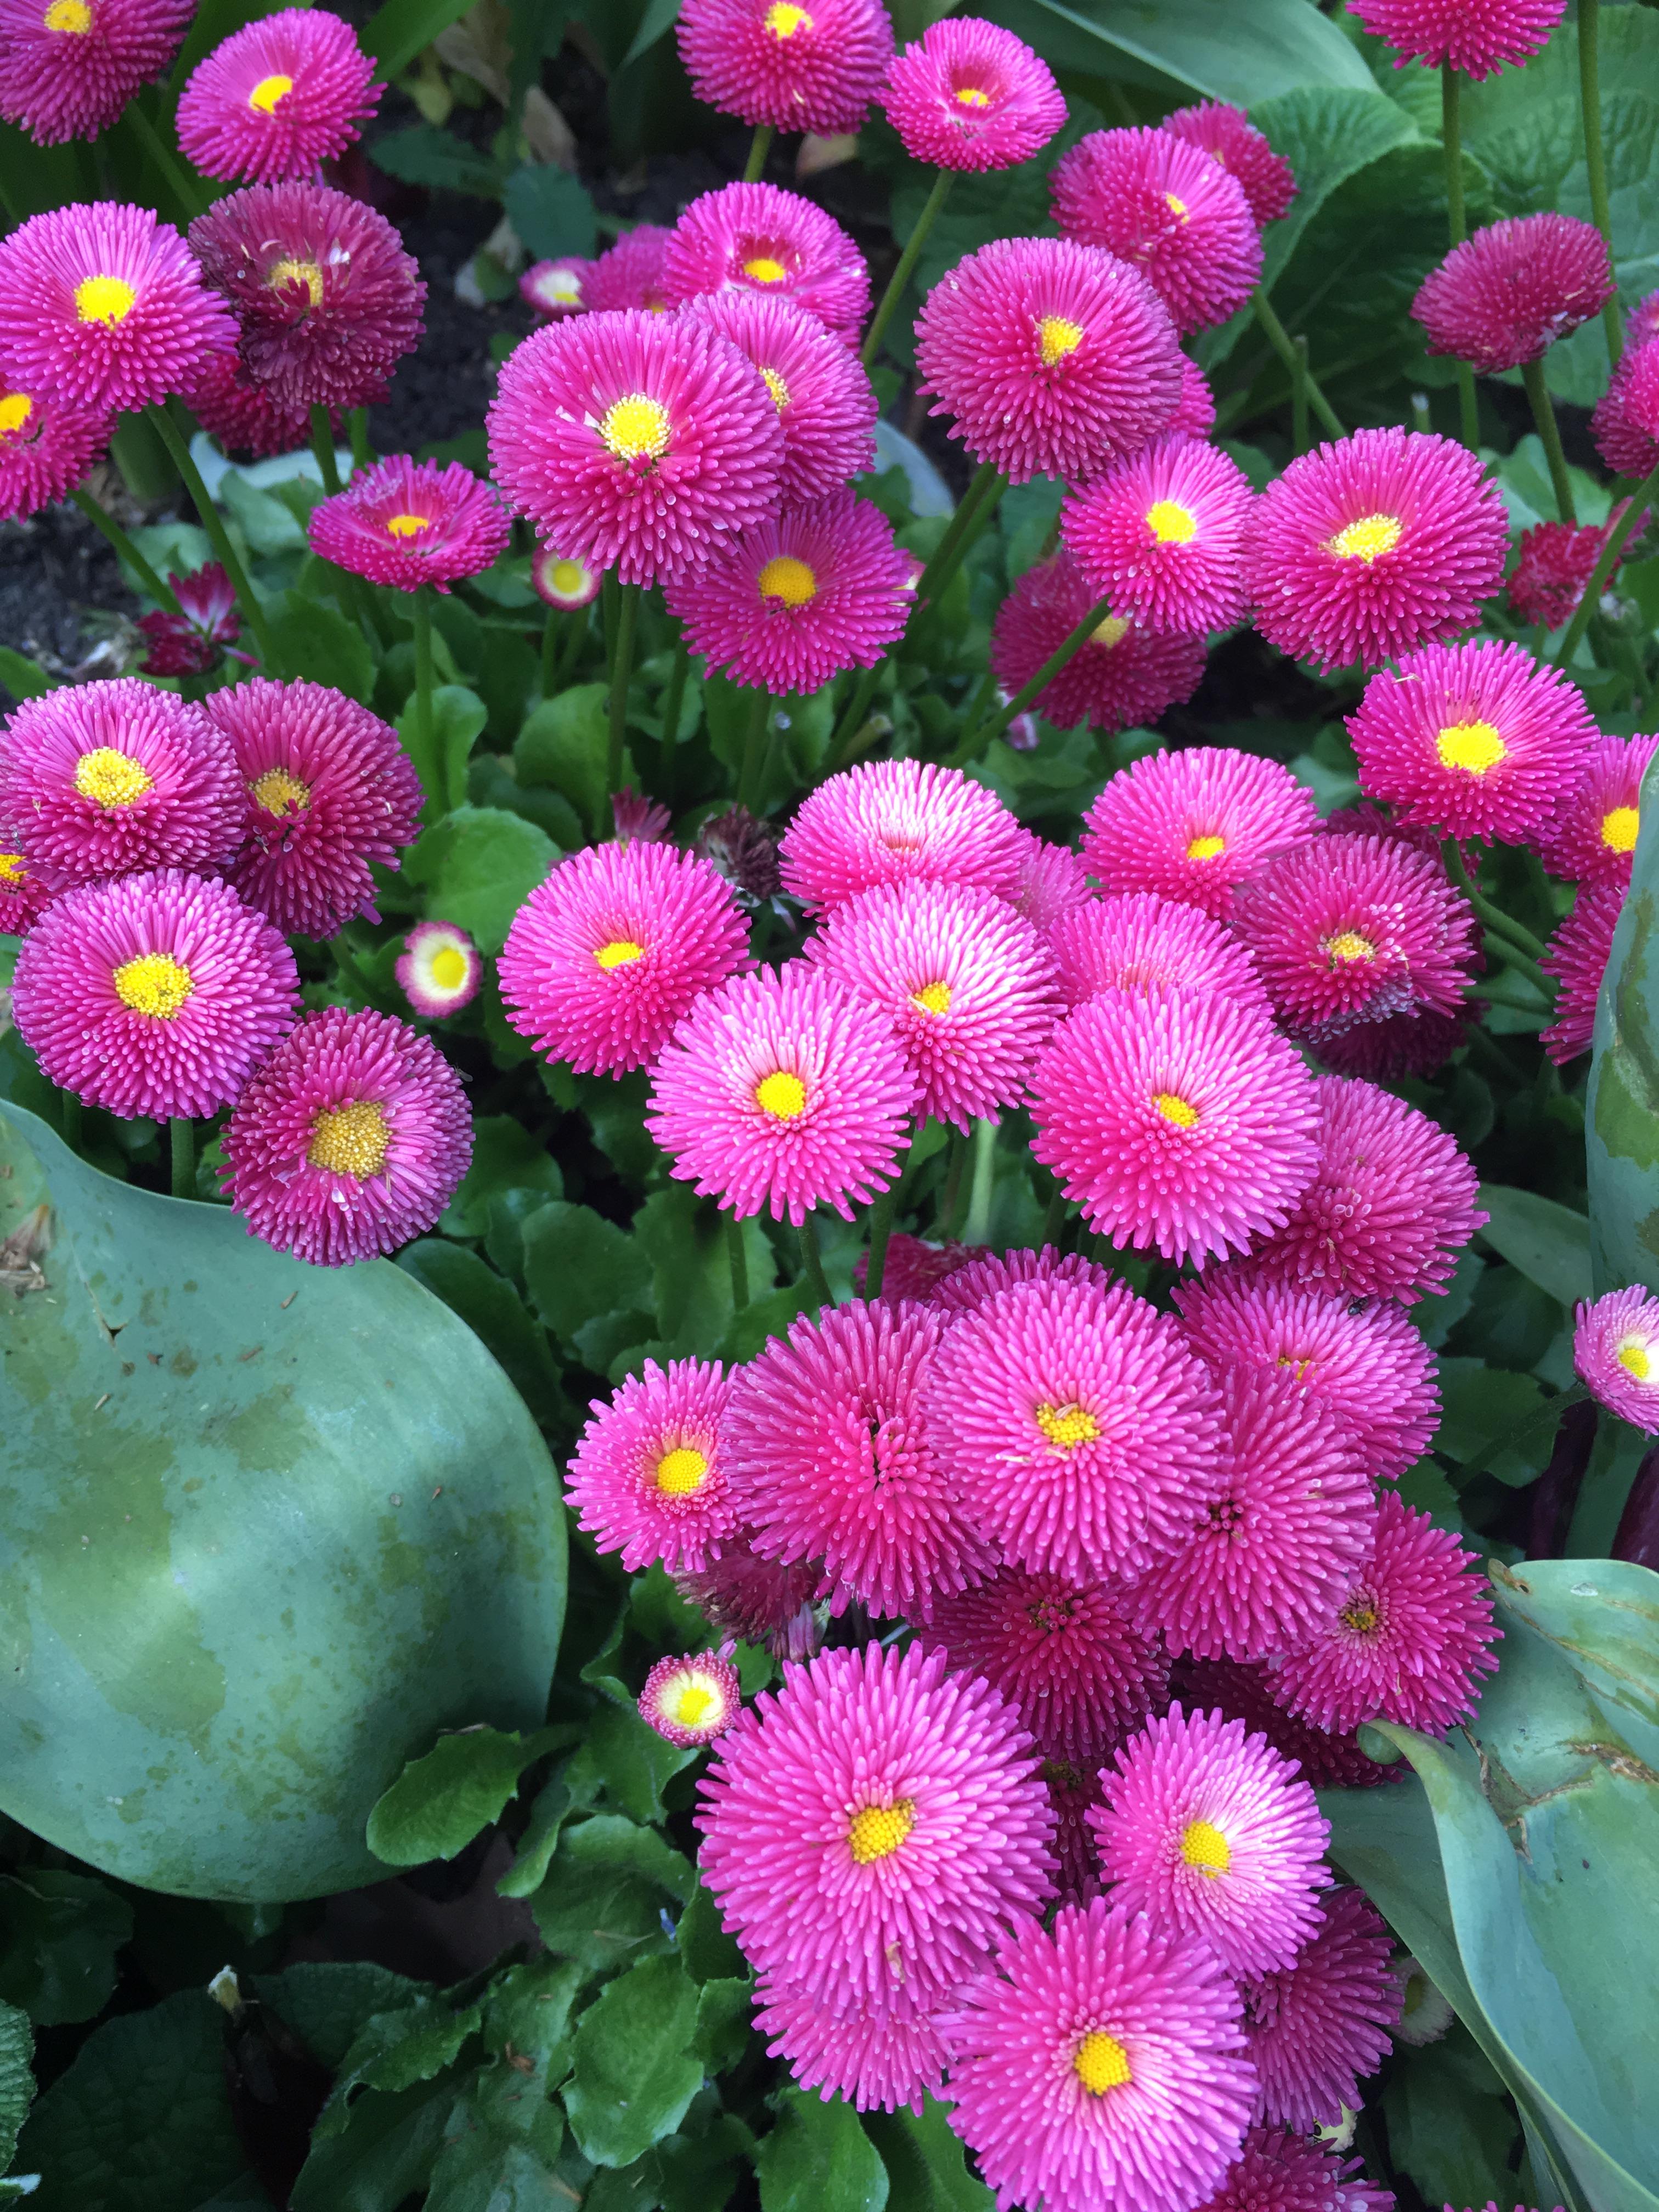 fiori-st-james-park-londra